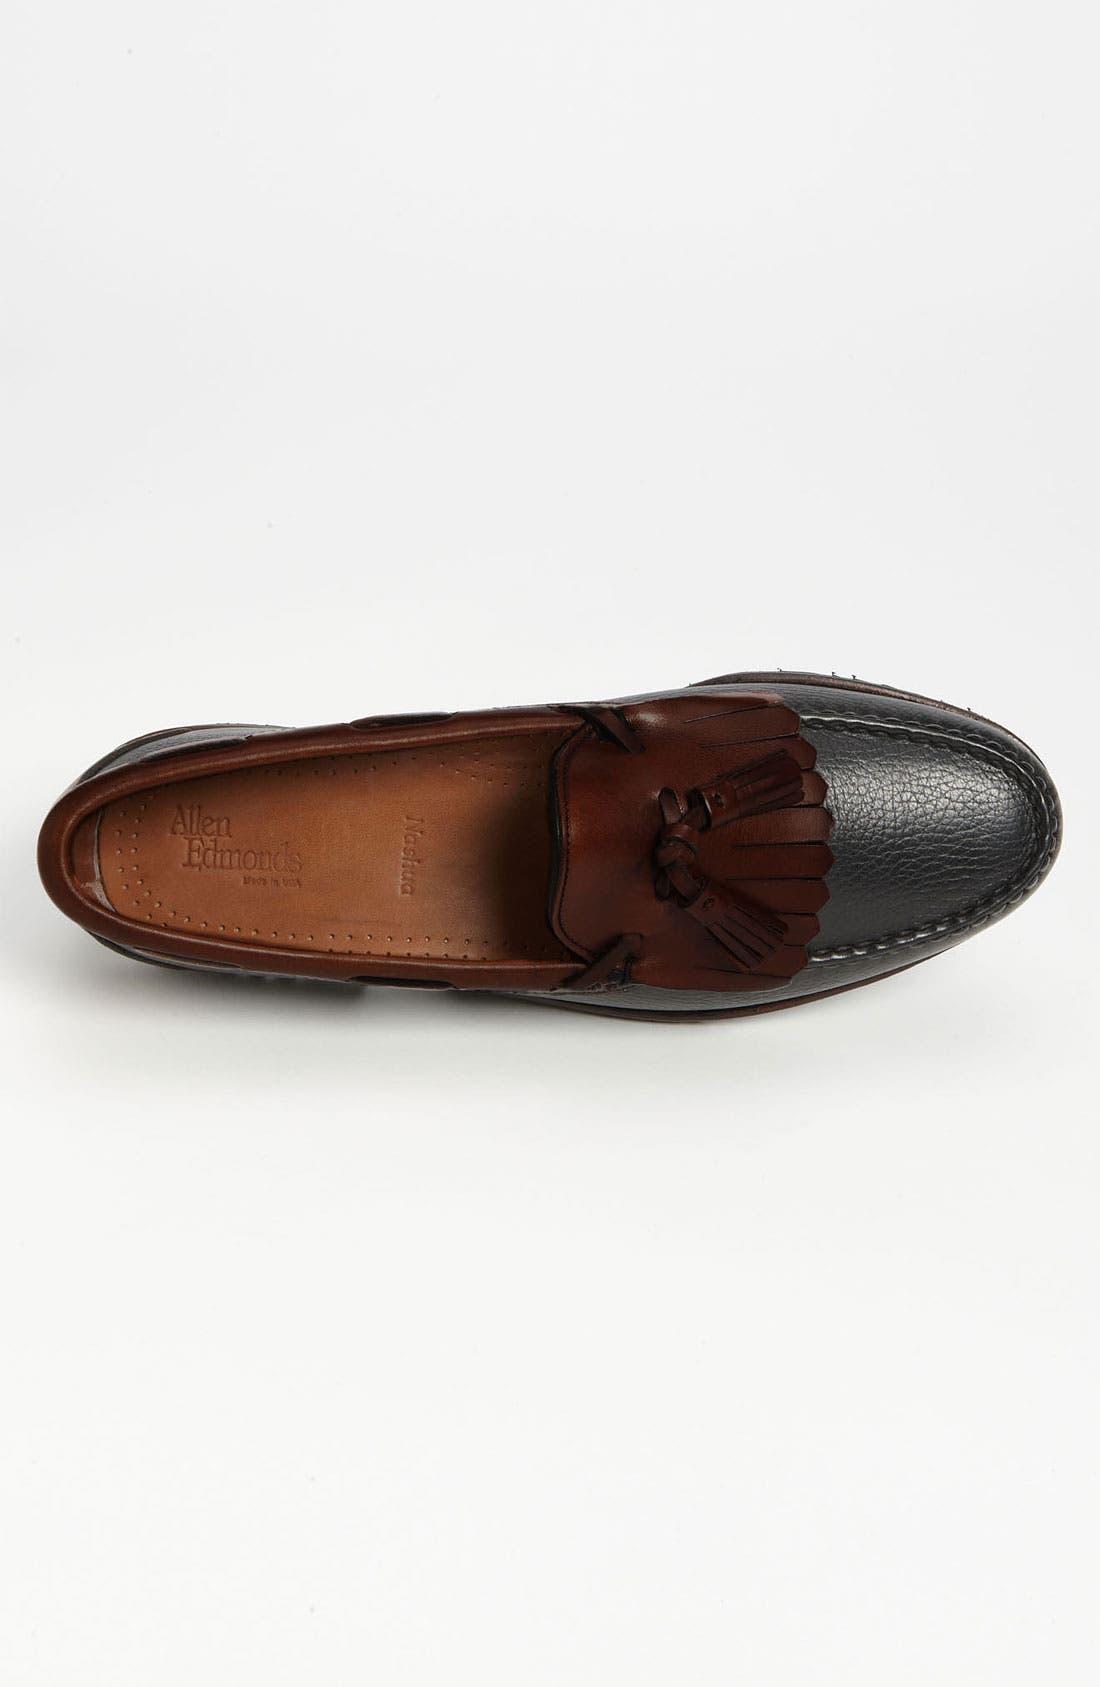 'Nashua' Tassel Loafer,                             Alternate thumbnail 3, color,                             Black/ Brown